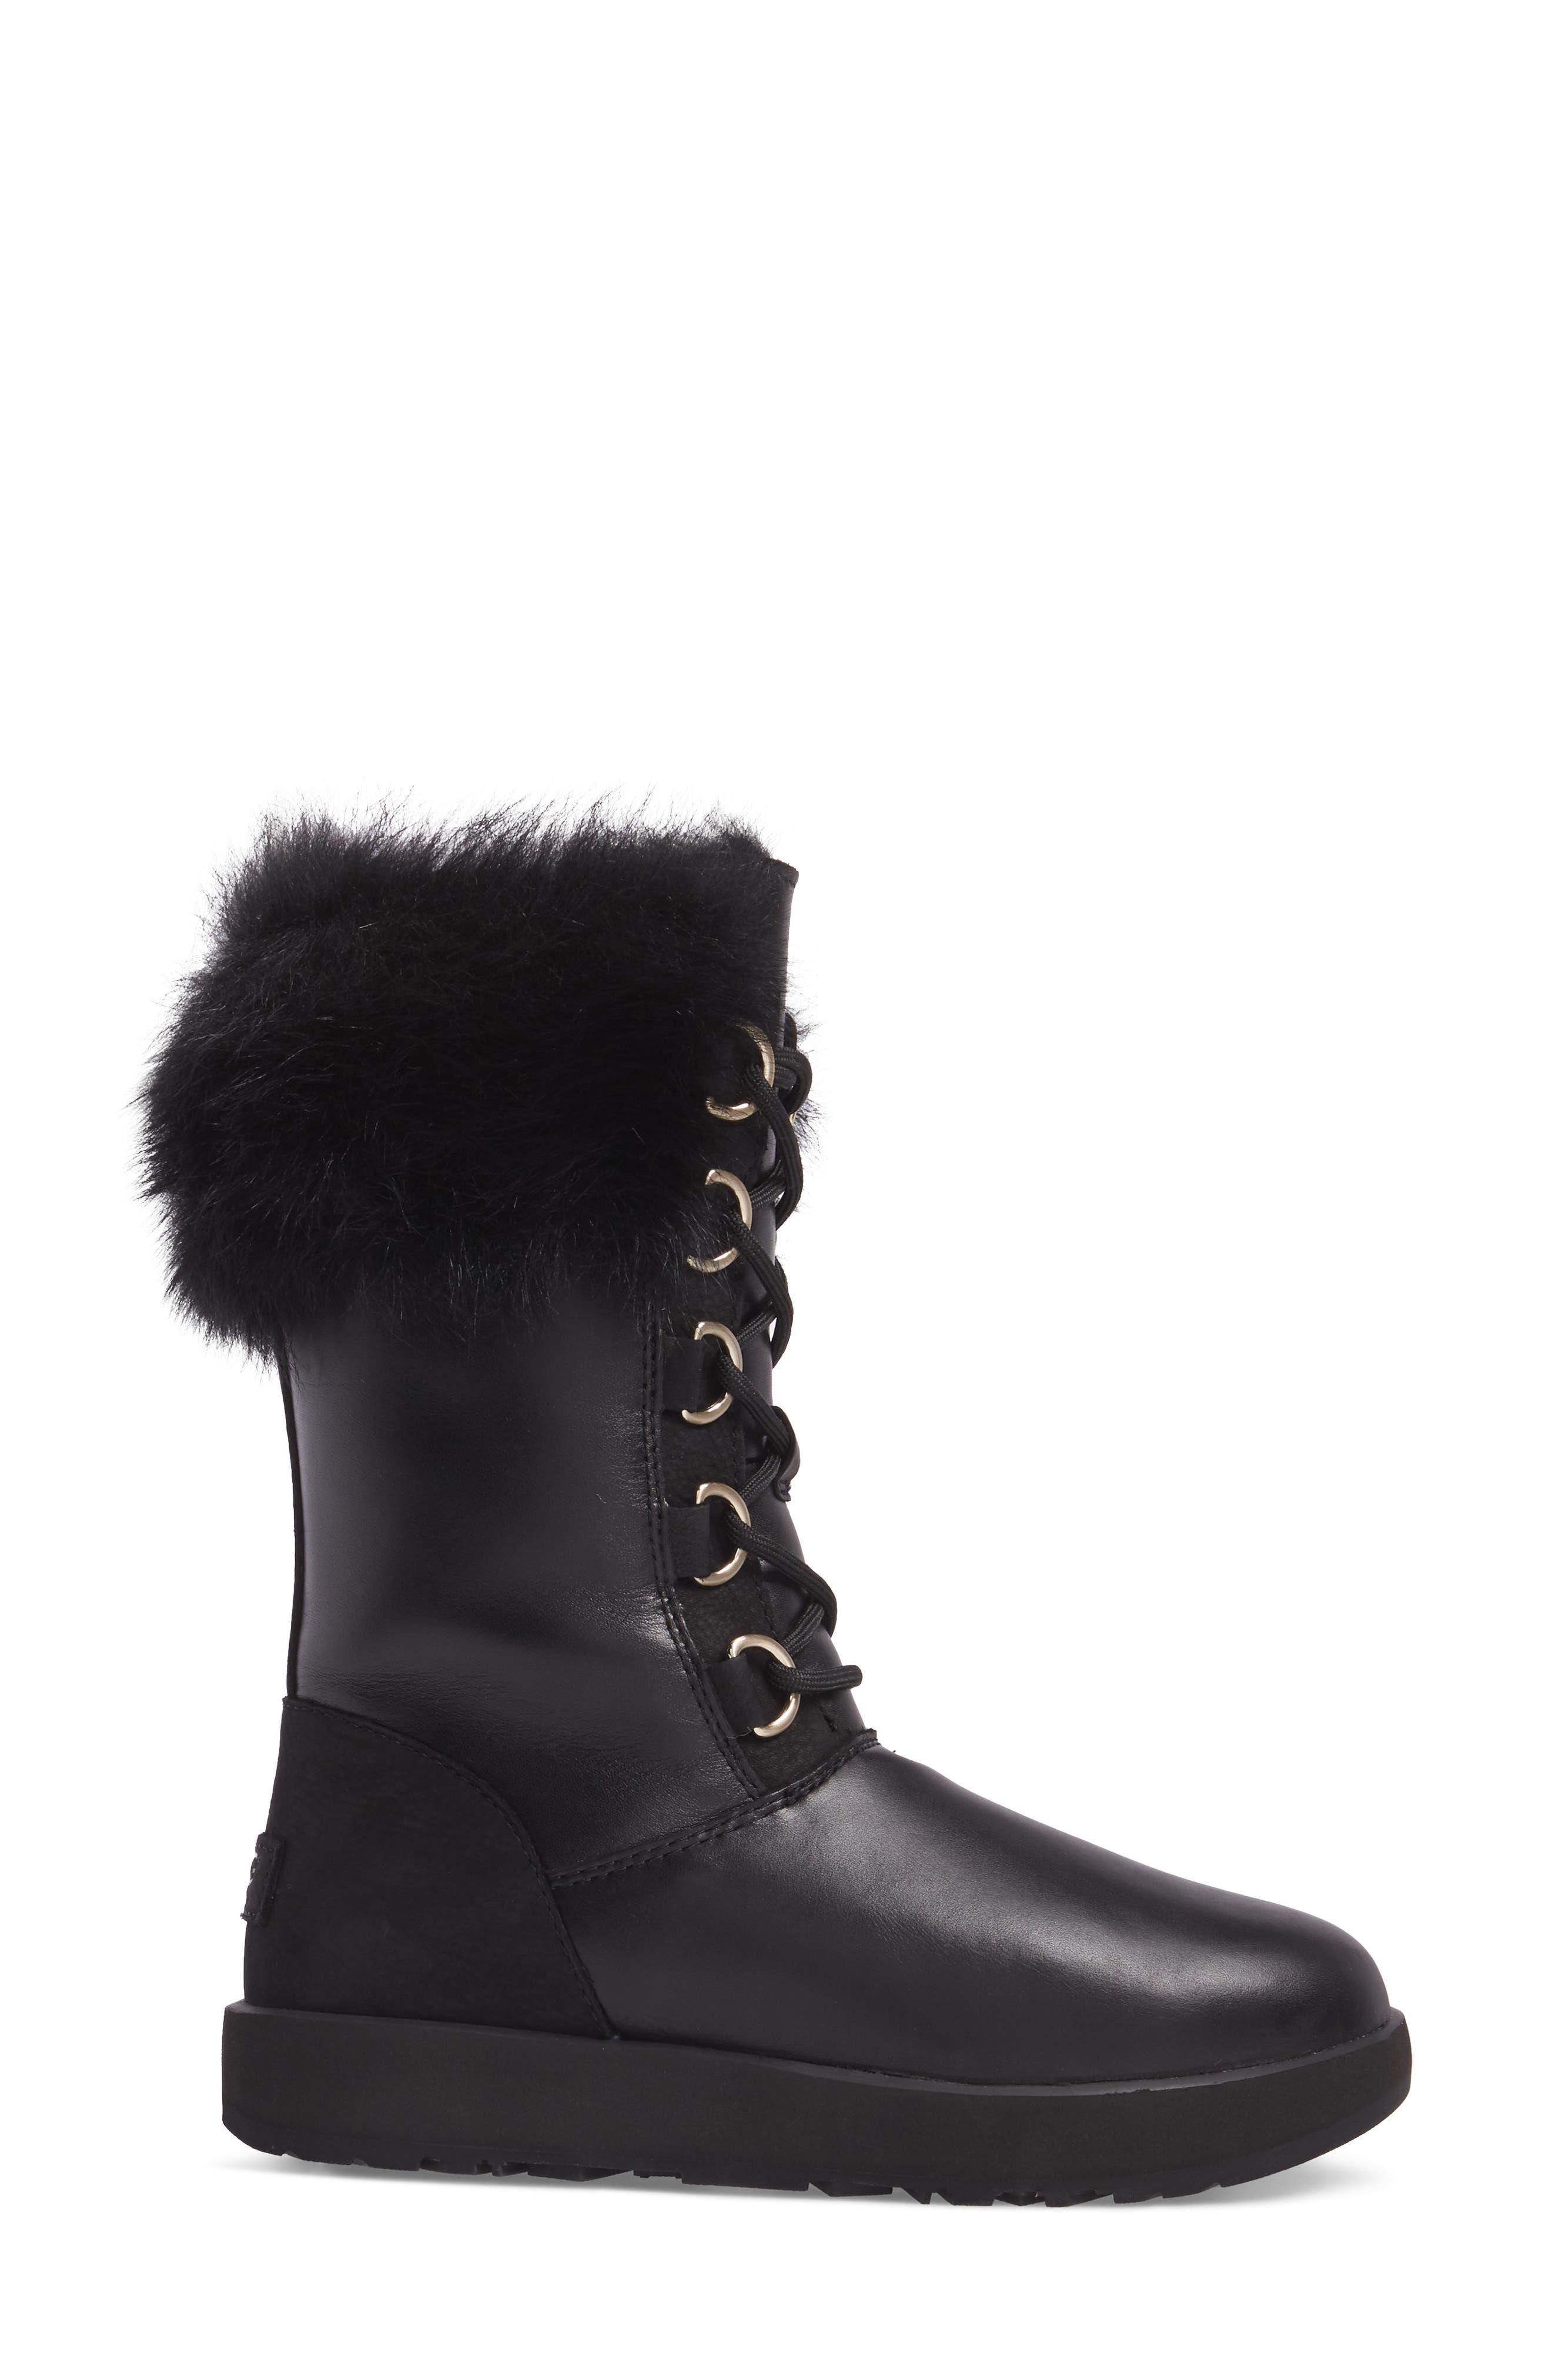 Aya Waterproof Snow Boot,                             Alternate thumbnail 3, color,                             001